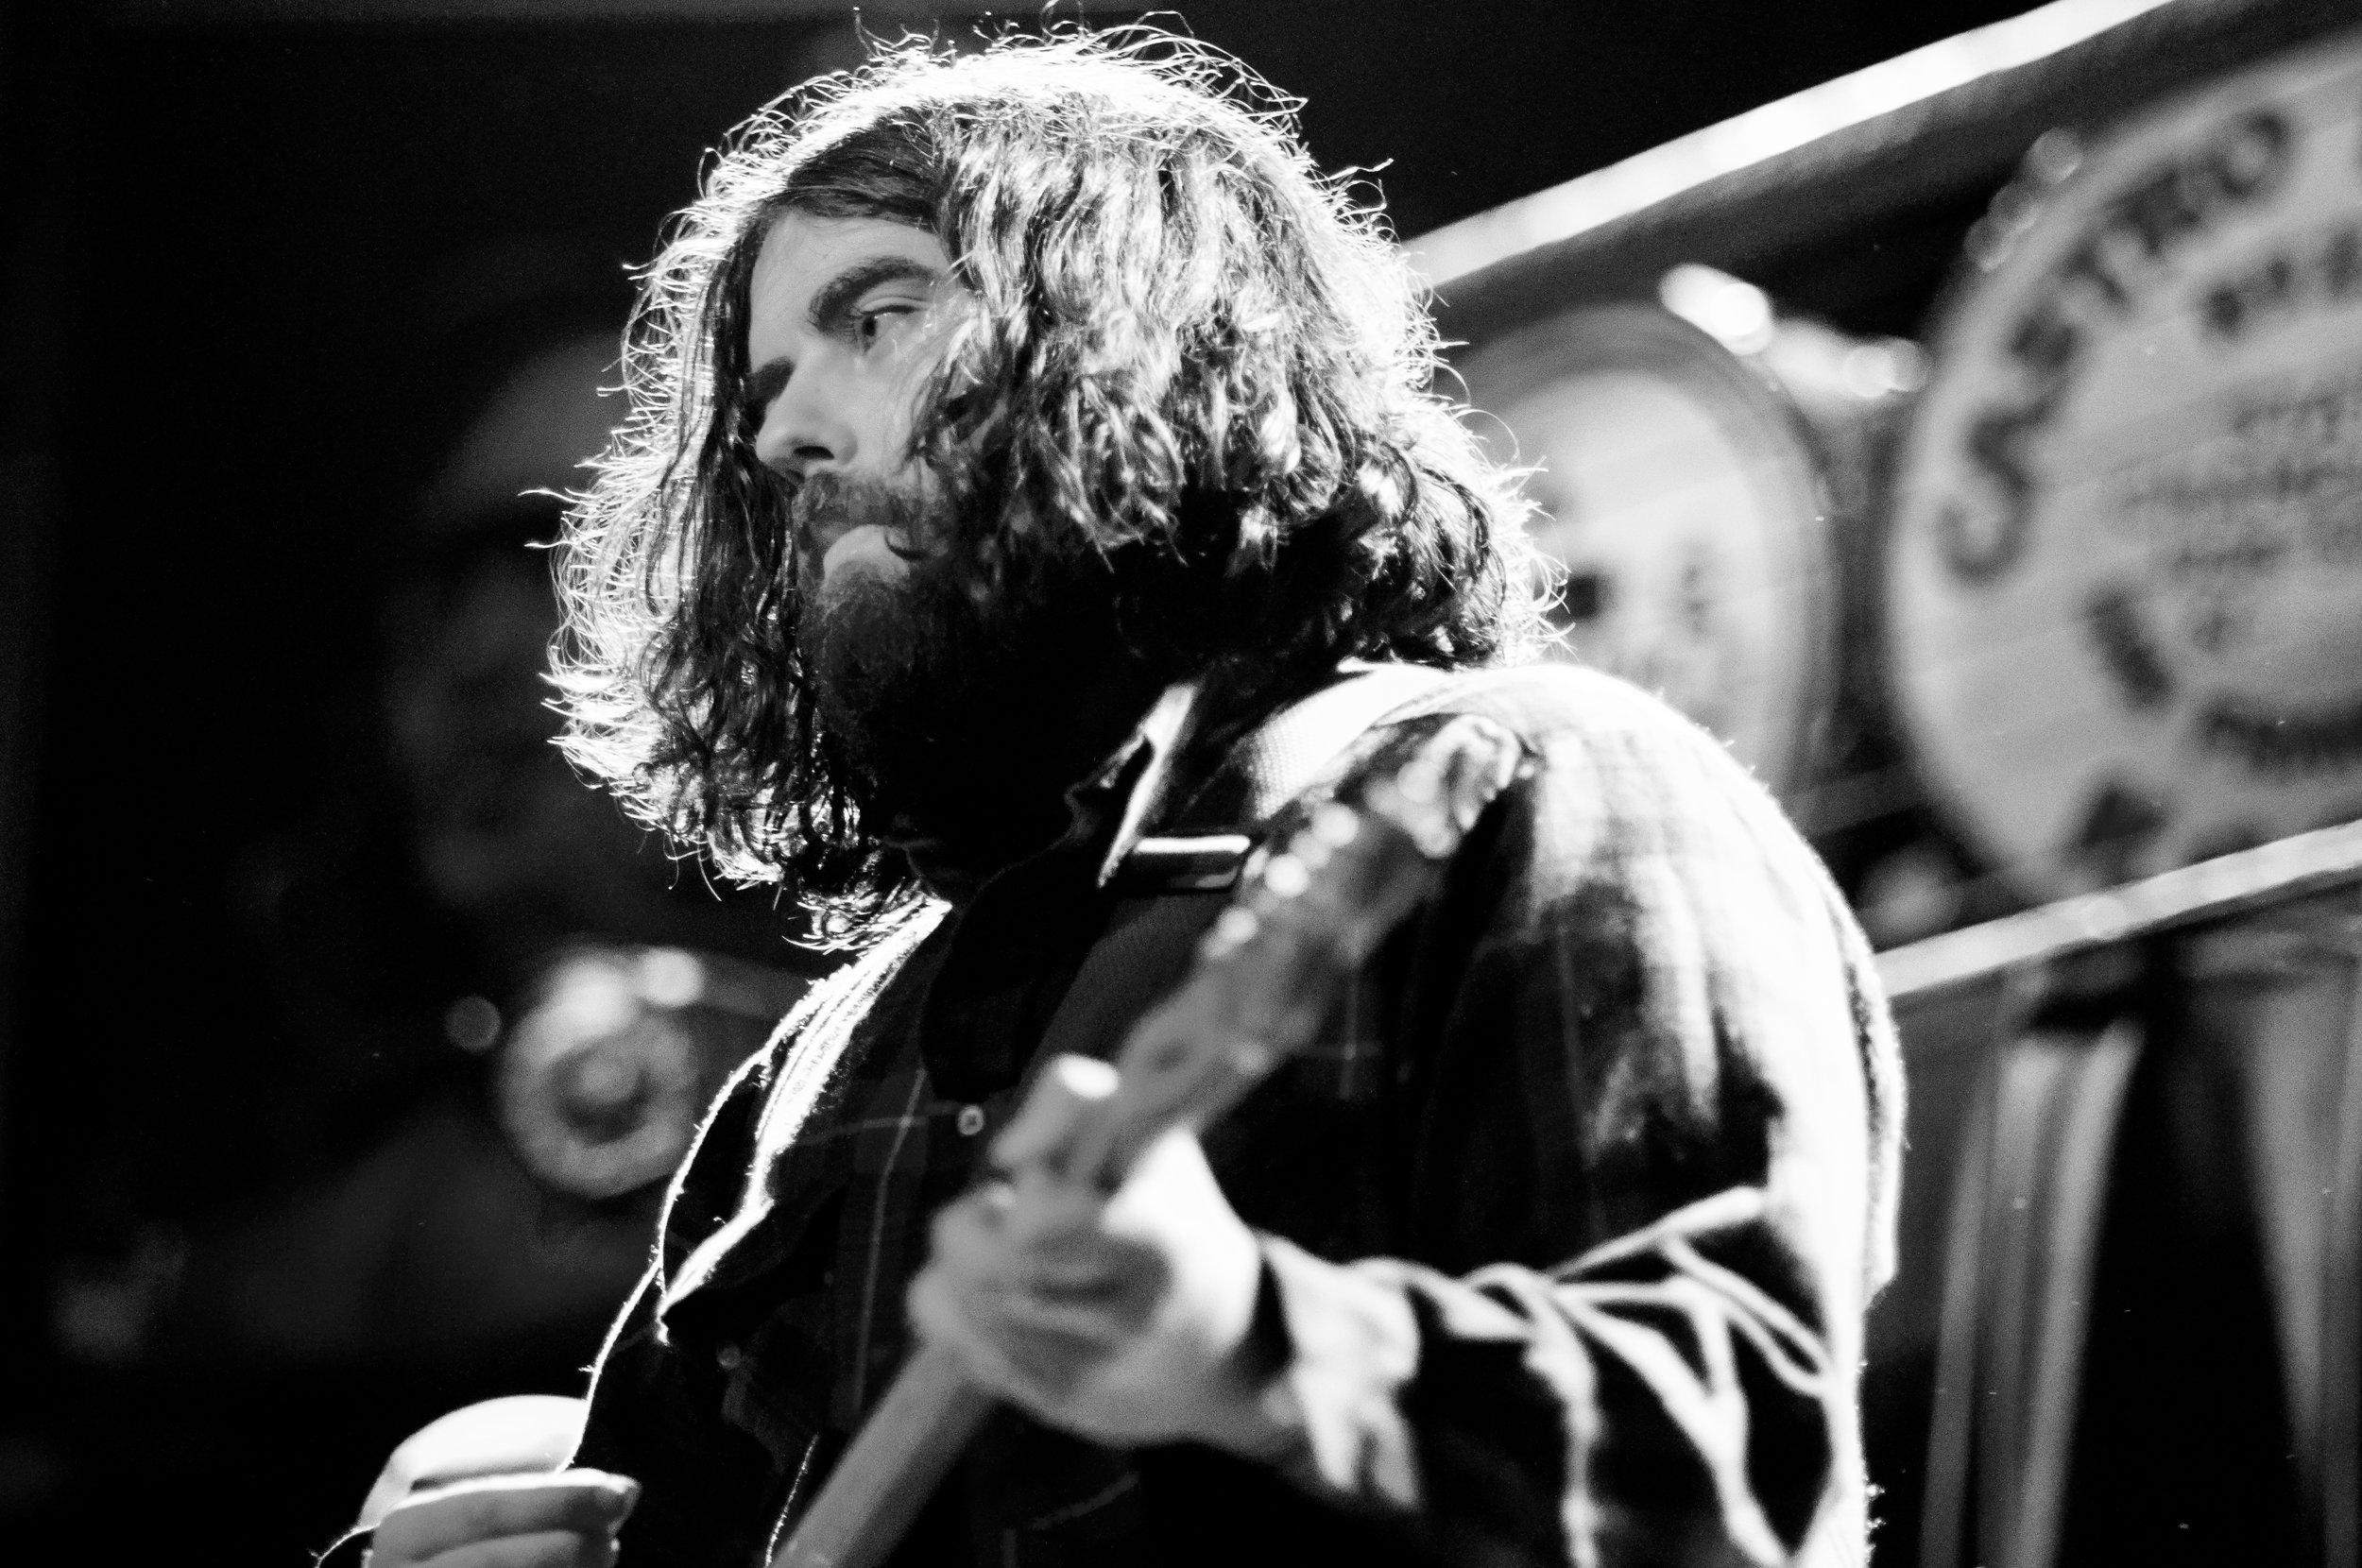 Kevin Murphy of The Moondoggies, Mississippi Studios, Portland, Oregon, 2016